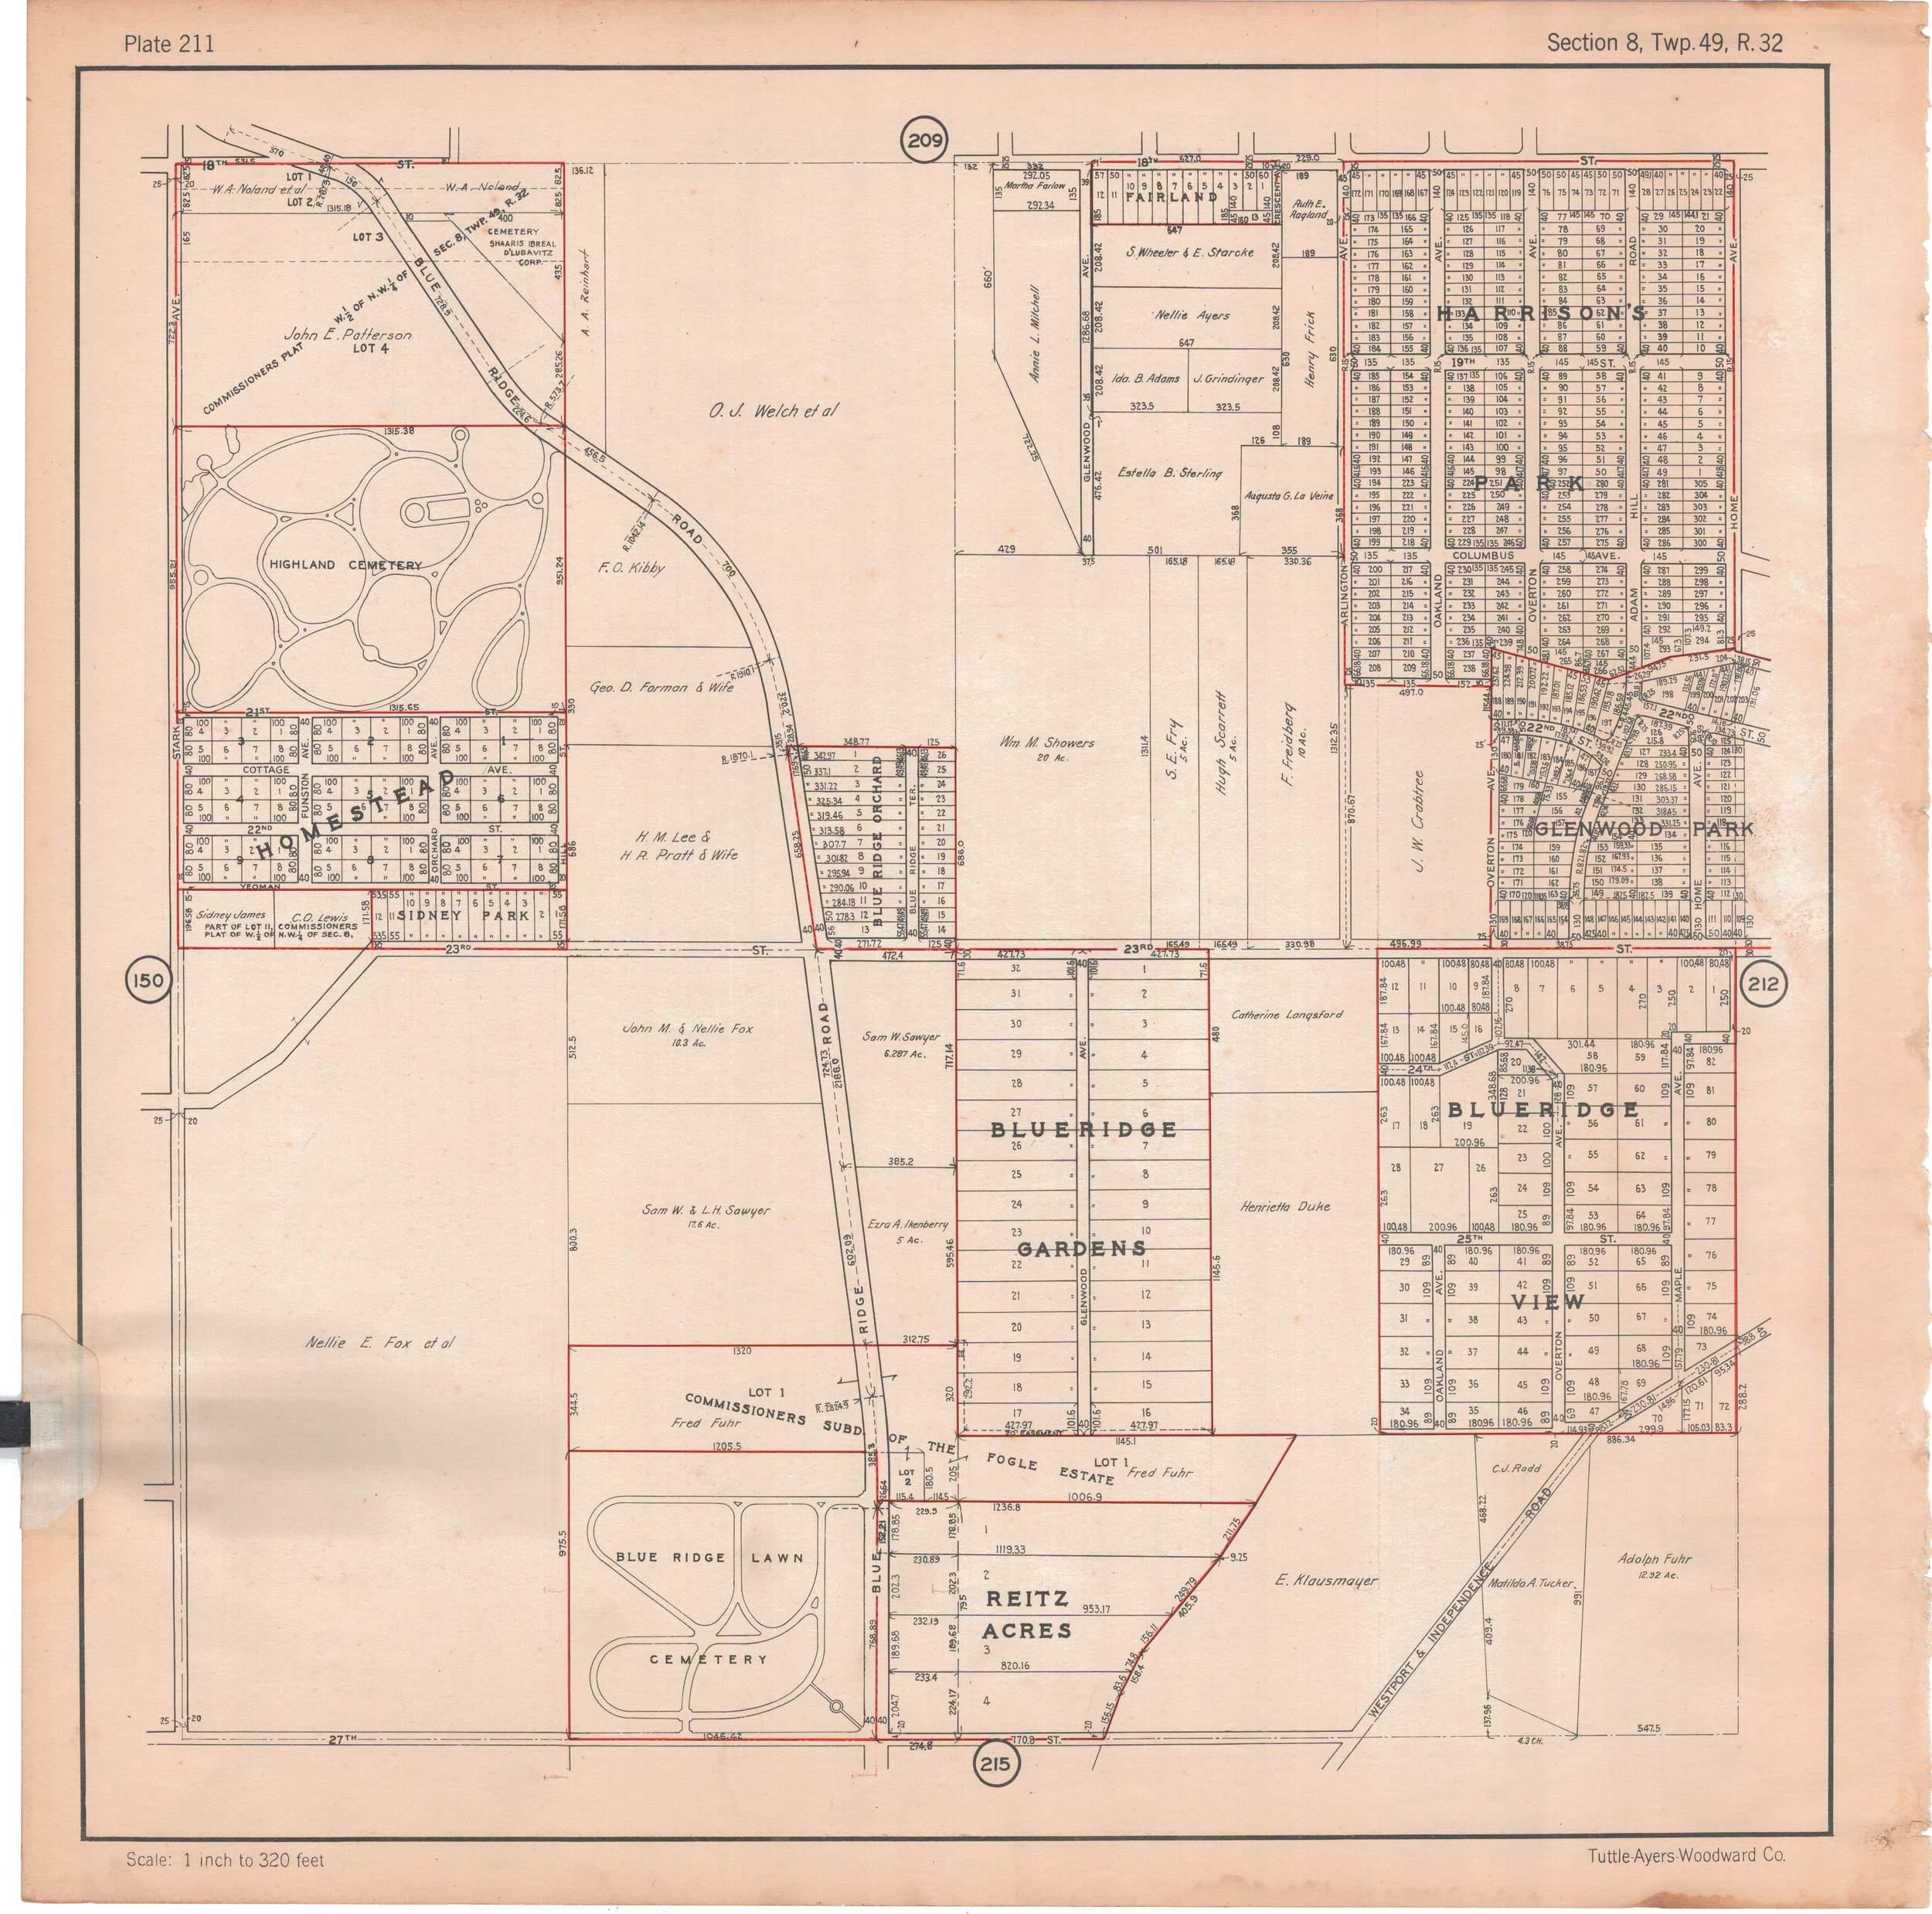 1925 TUTTLE_AYERS_Plate_211.JPG